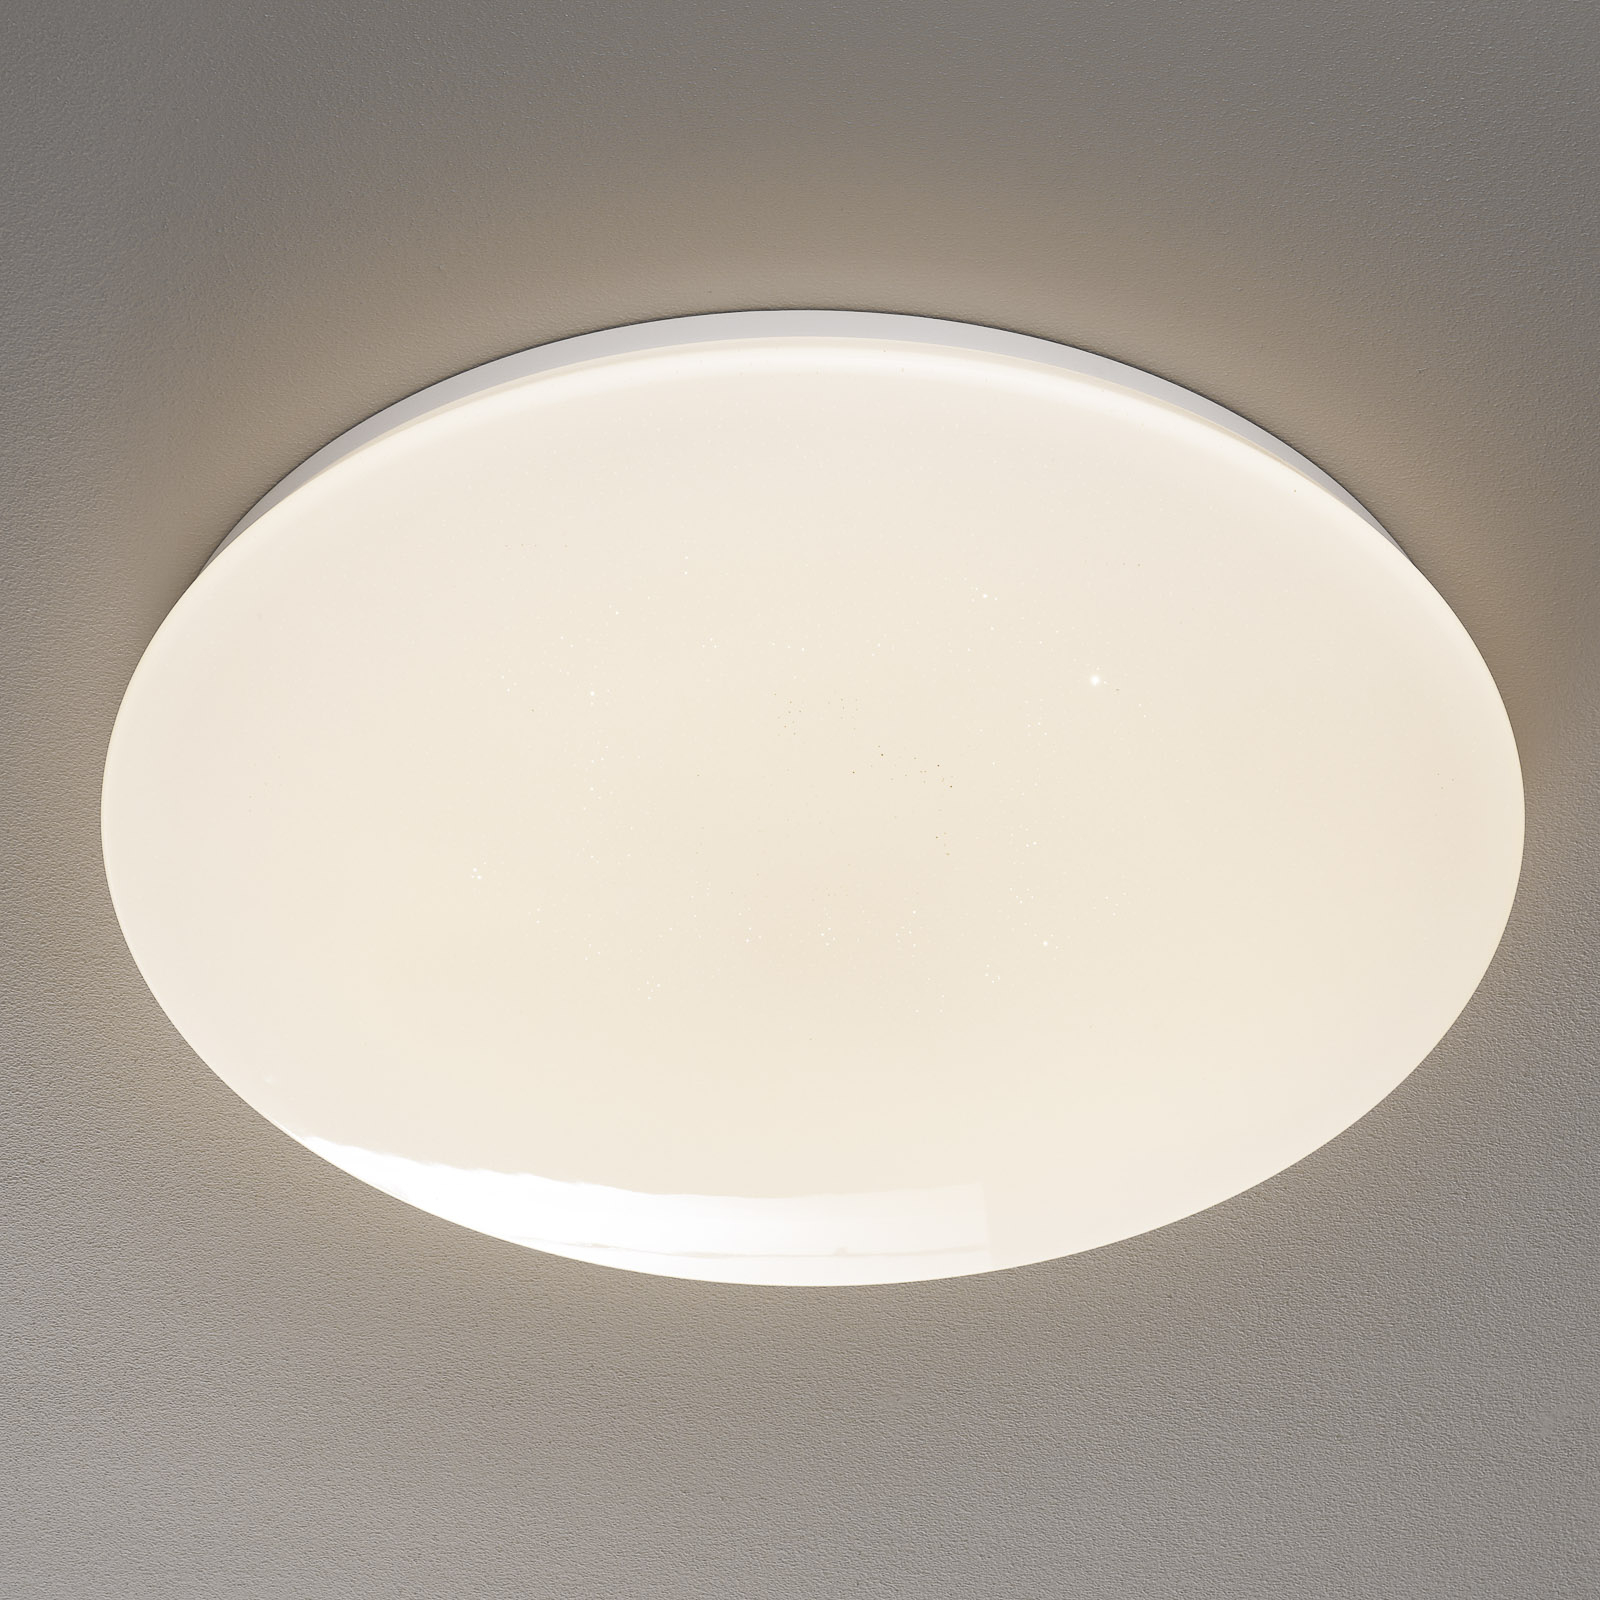 Trio WiZ Nalida lampa sufitowa LED efekt starlight